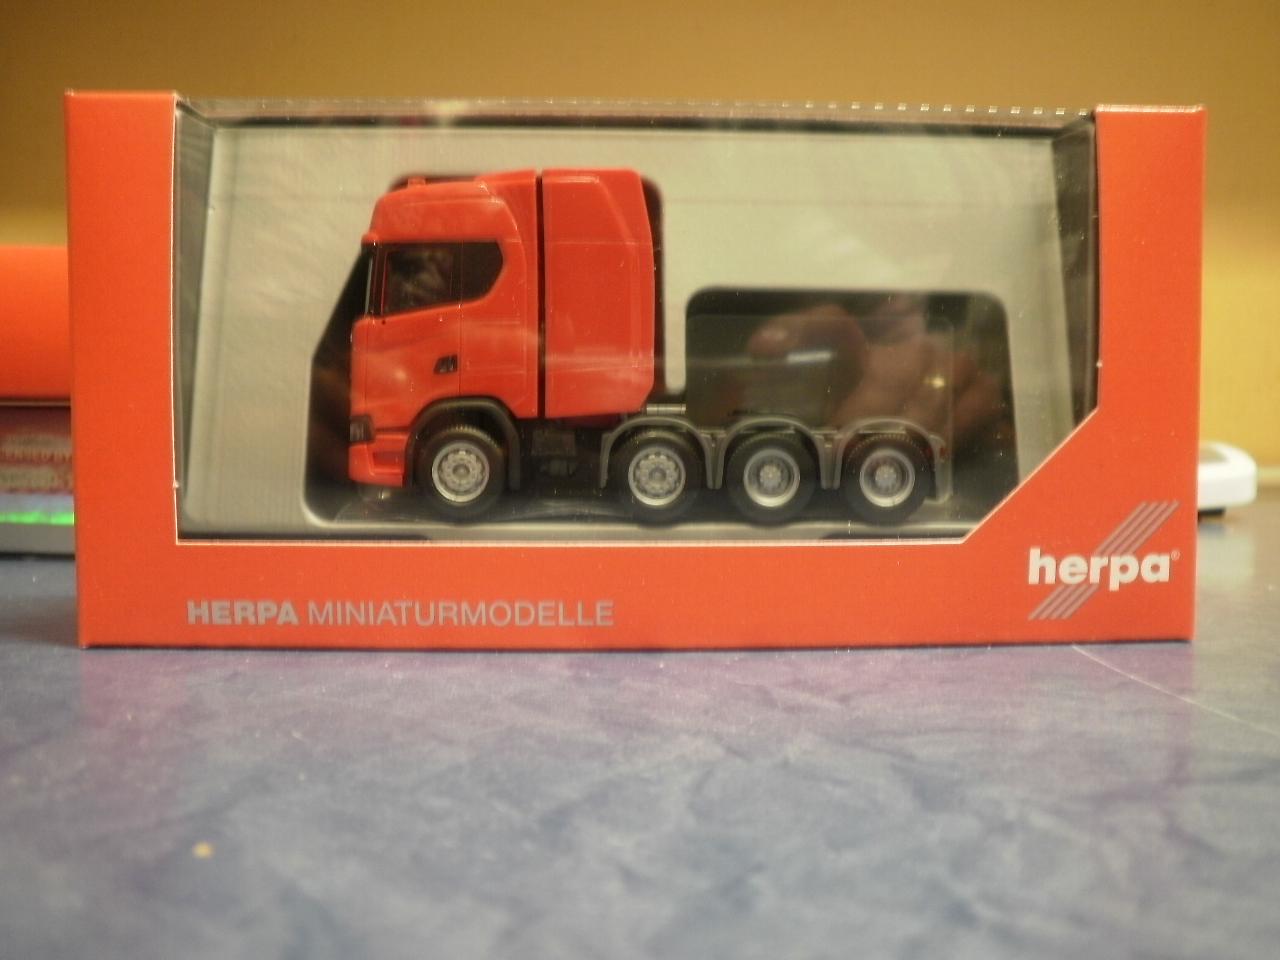 Herpa LKW Scania CS 20 HD SZM 2achs m.Lampenbügel Rammschutz ultramarinblau 3101